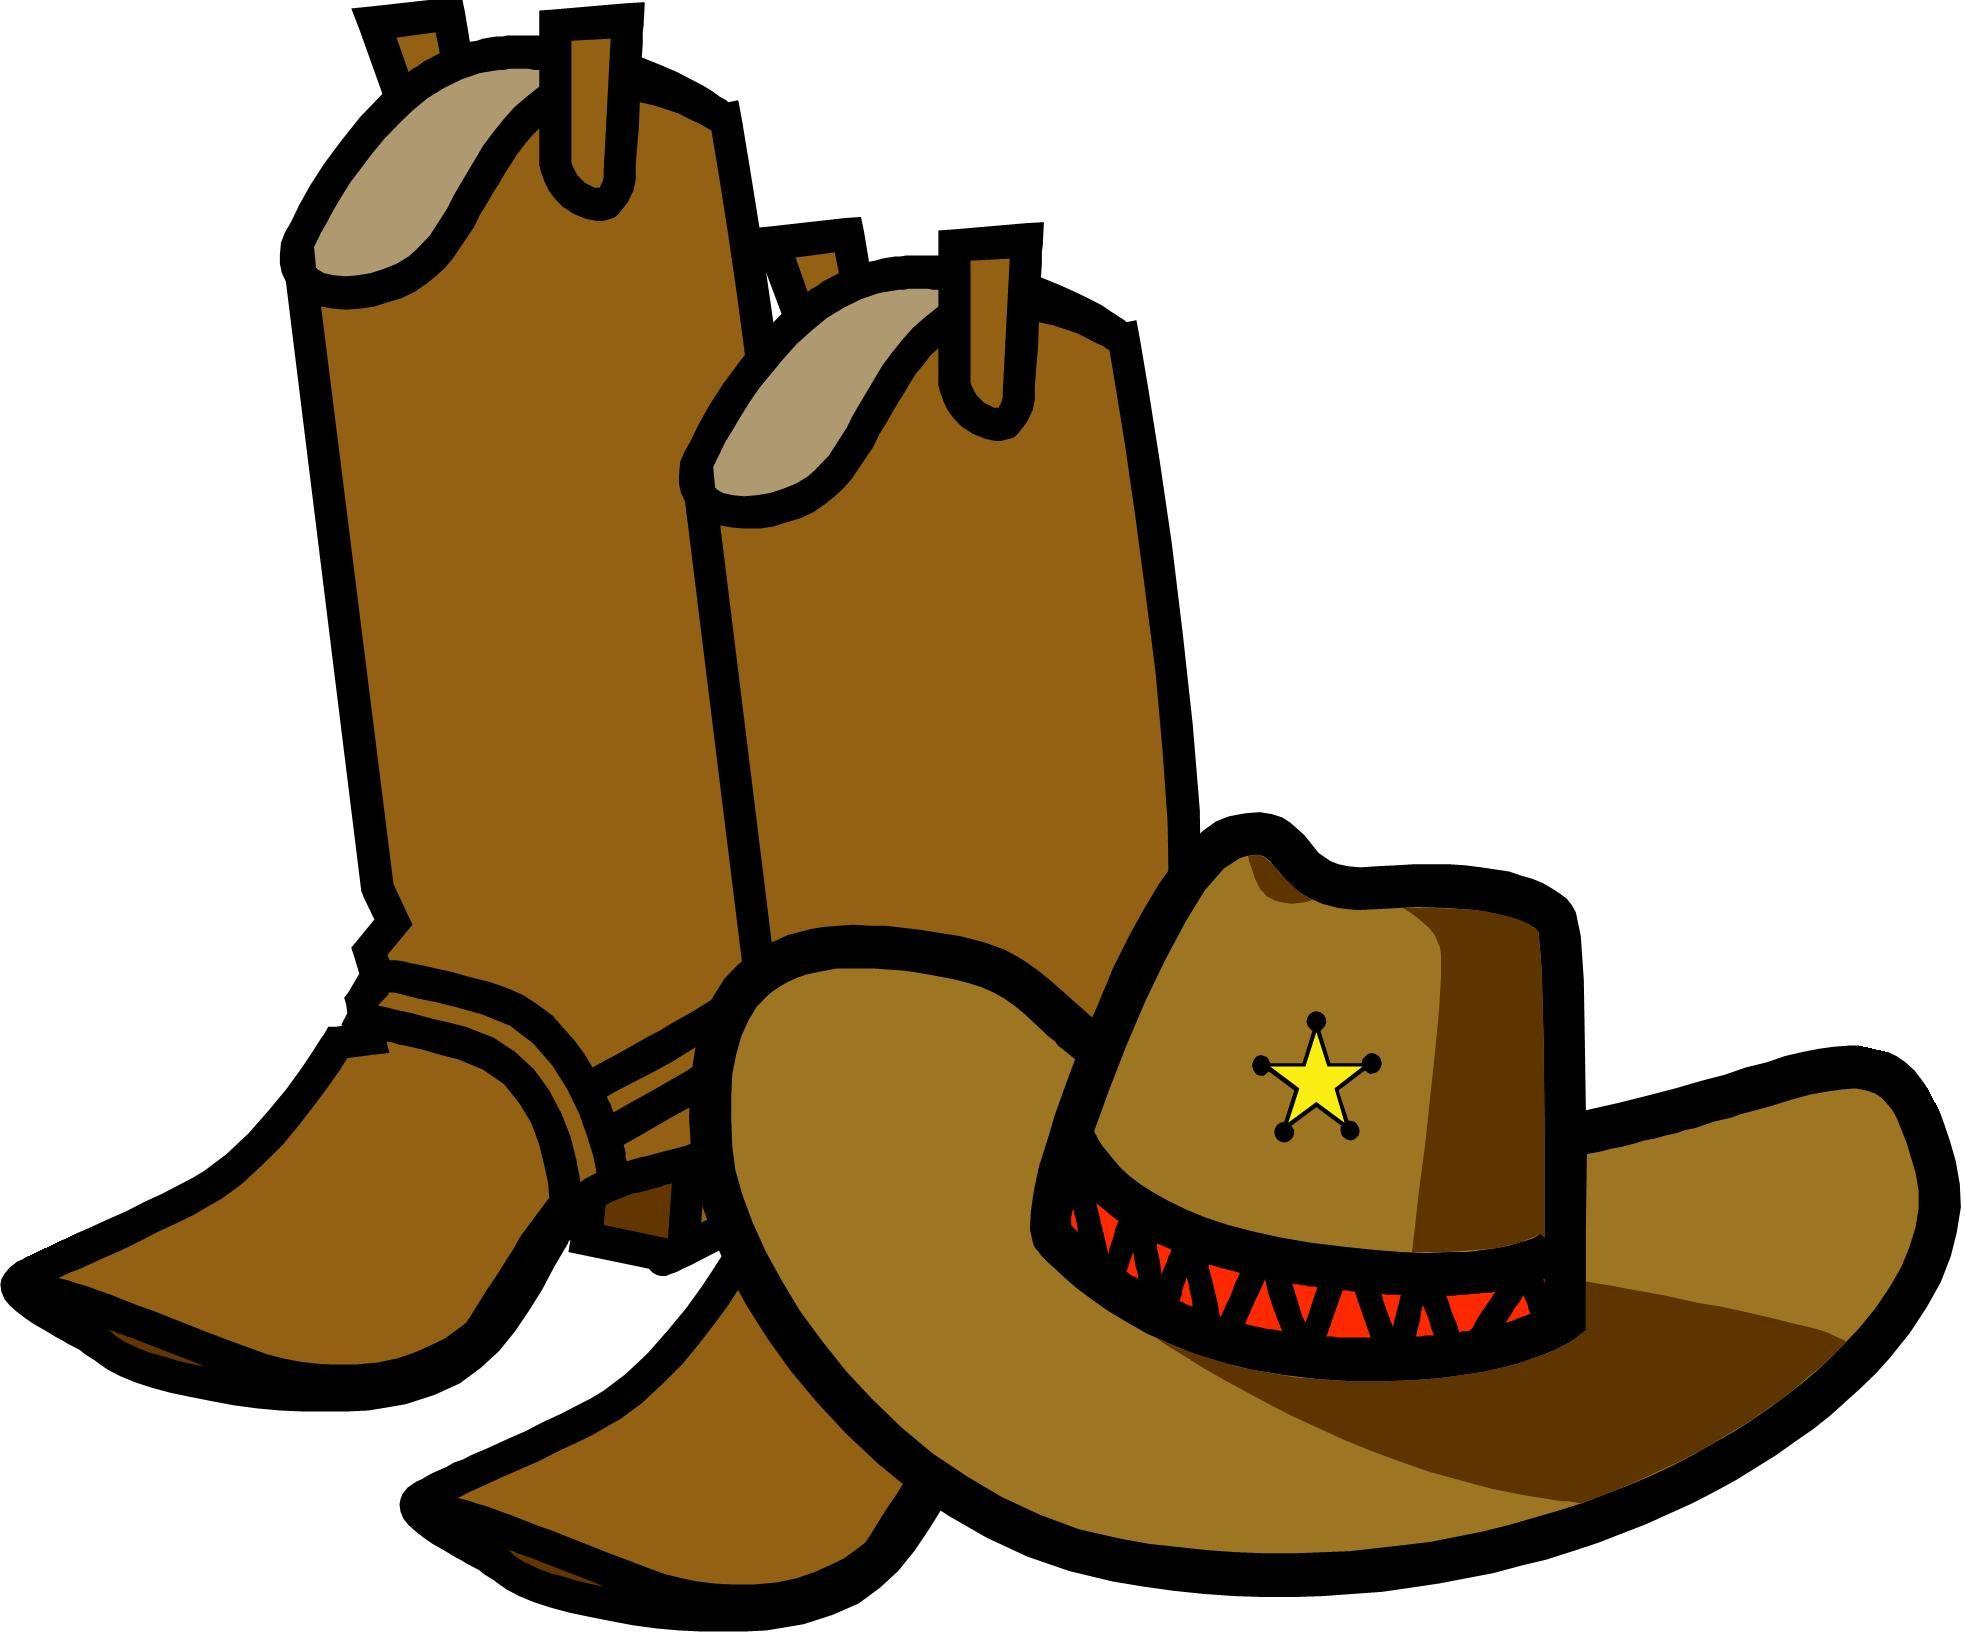 Body clipart cowboy. Image free cartoon western